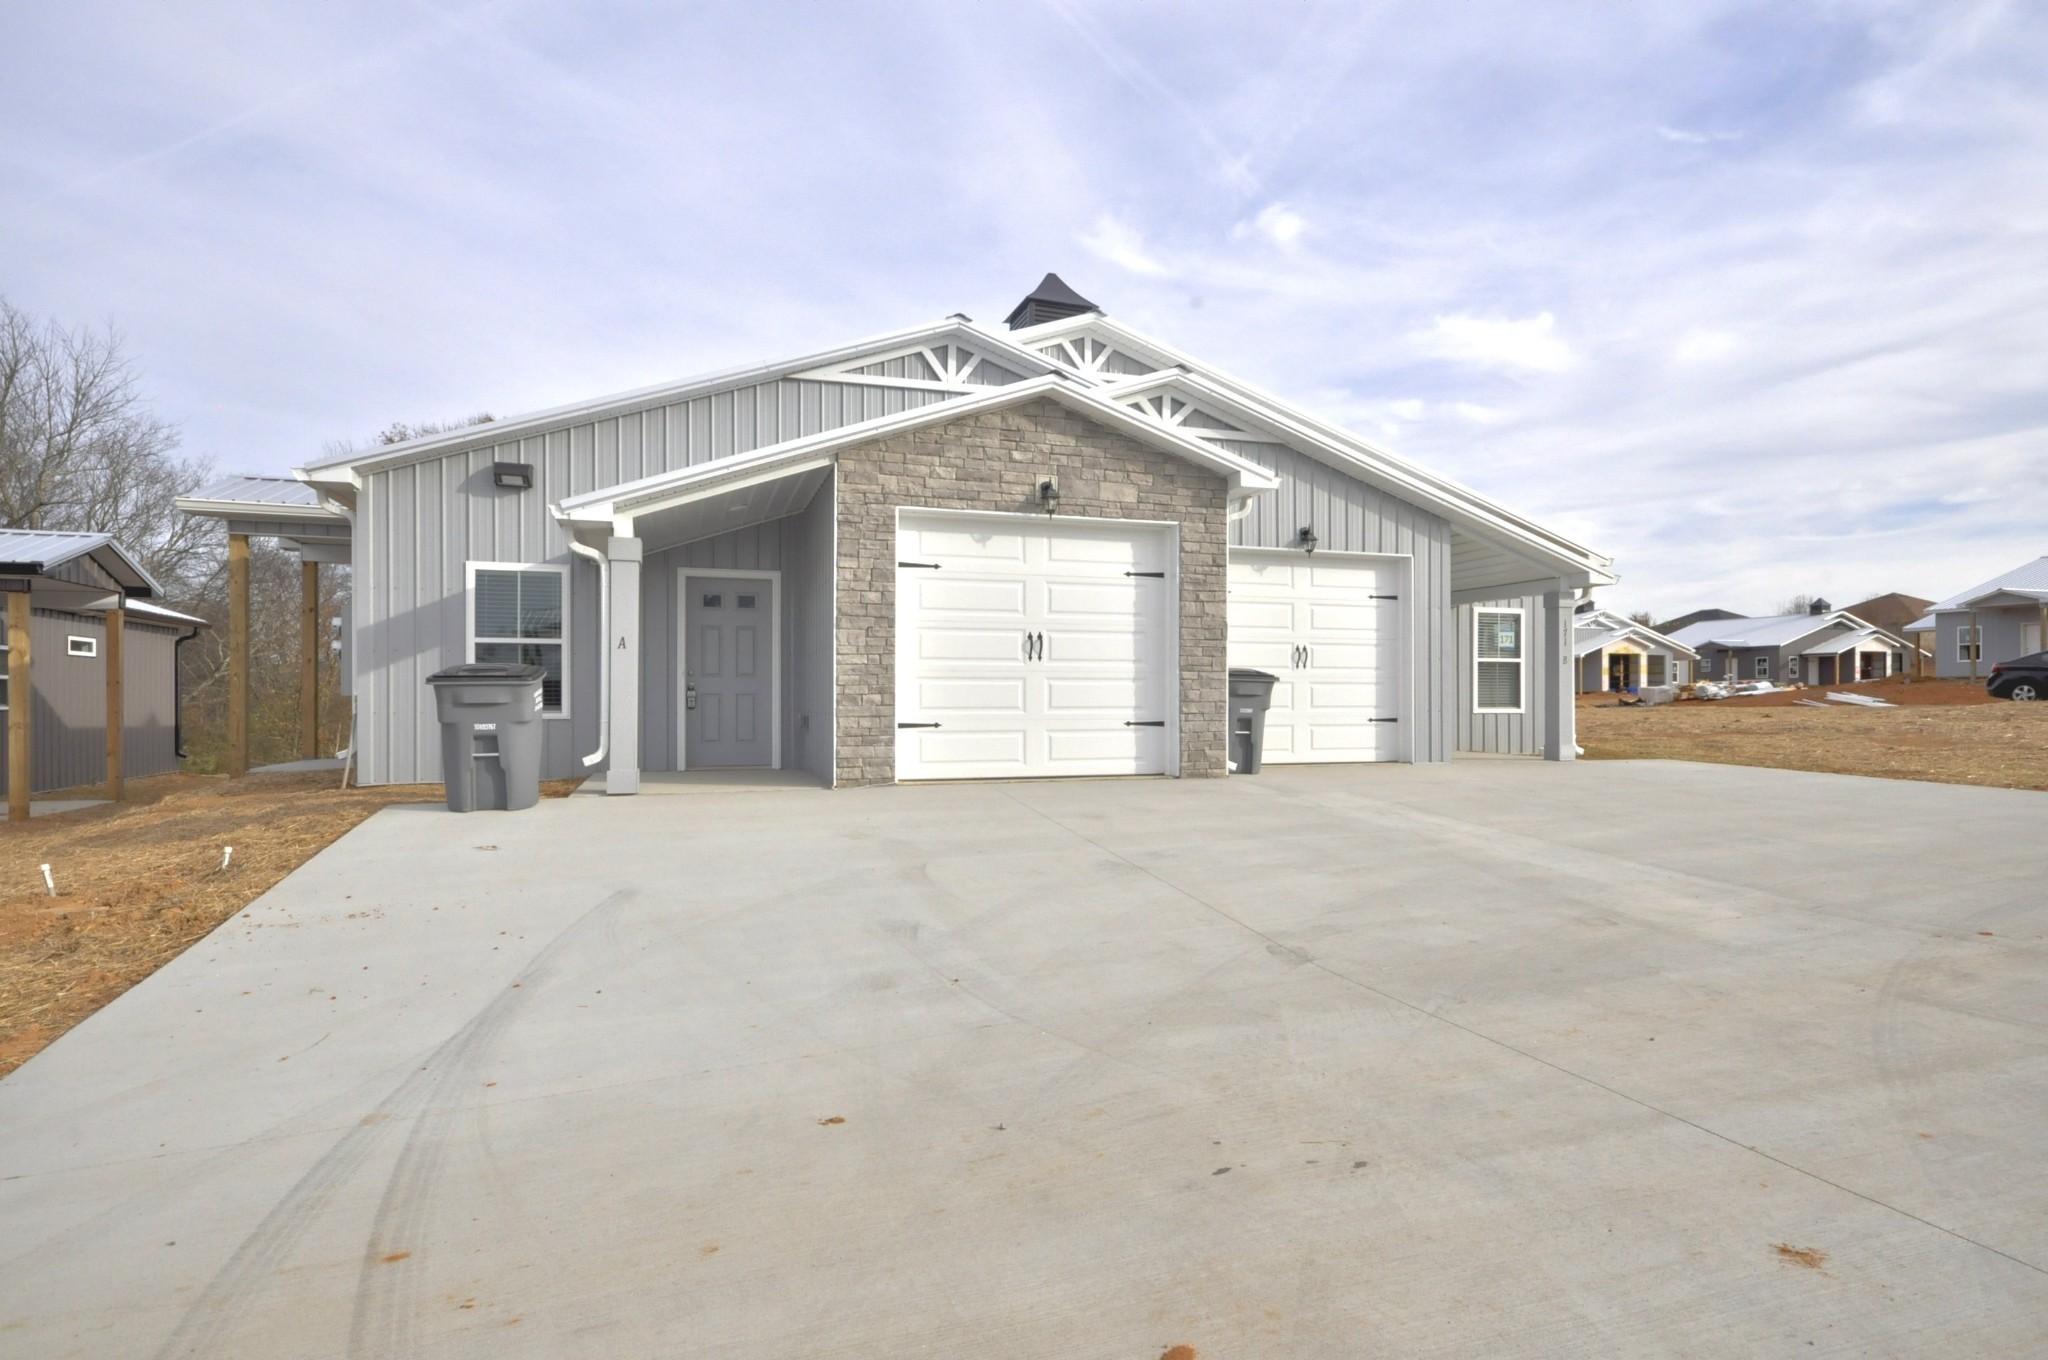 190 BAINBRIDGE DRIVE Unit A #A Property Photo - Clarksville, TN real estate listing